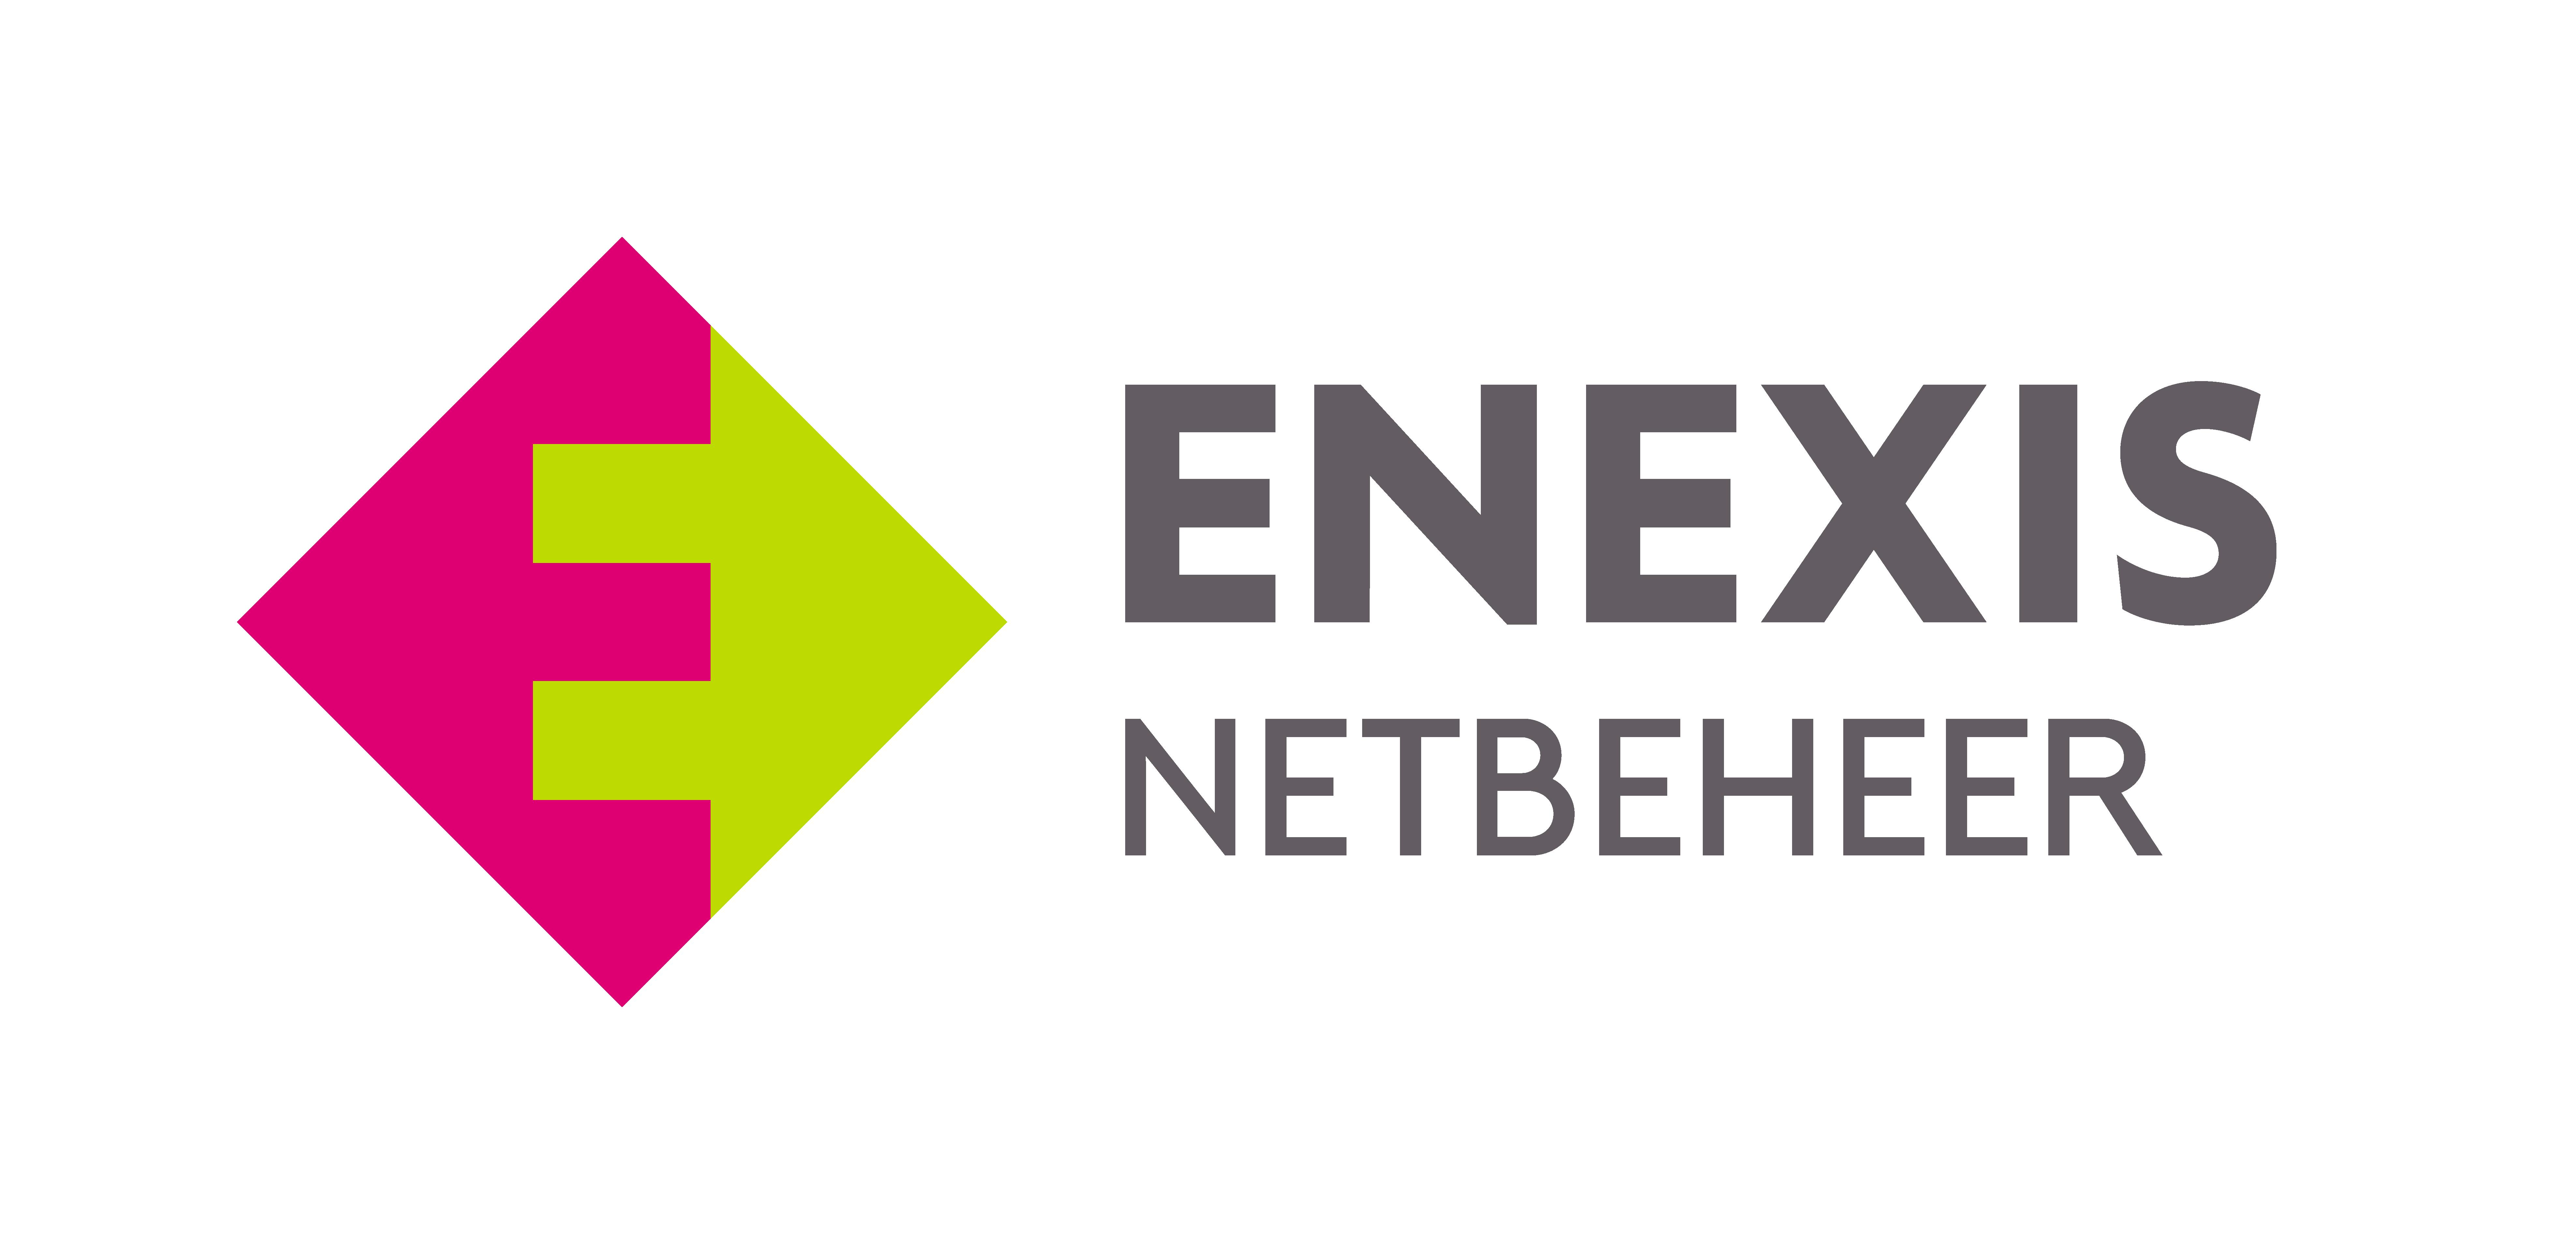 Enexis